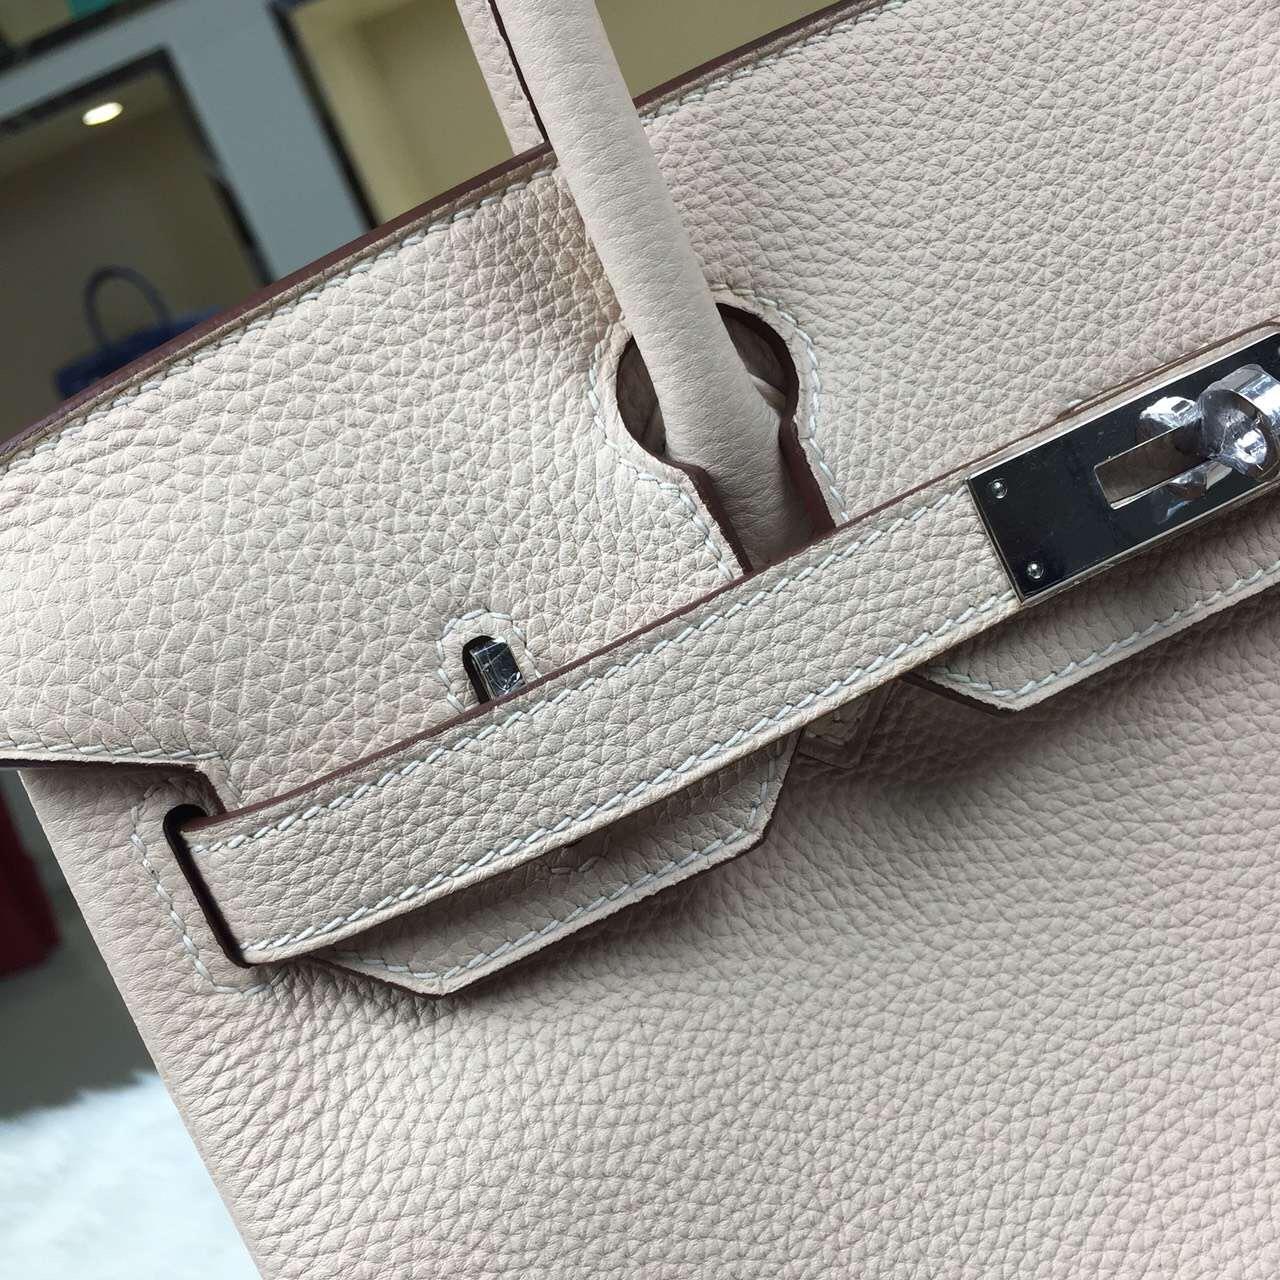 High Quality Hermes 3C Wool White Togo Leather Birkin Bag 30CM Silver Hardware